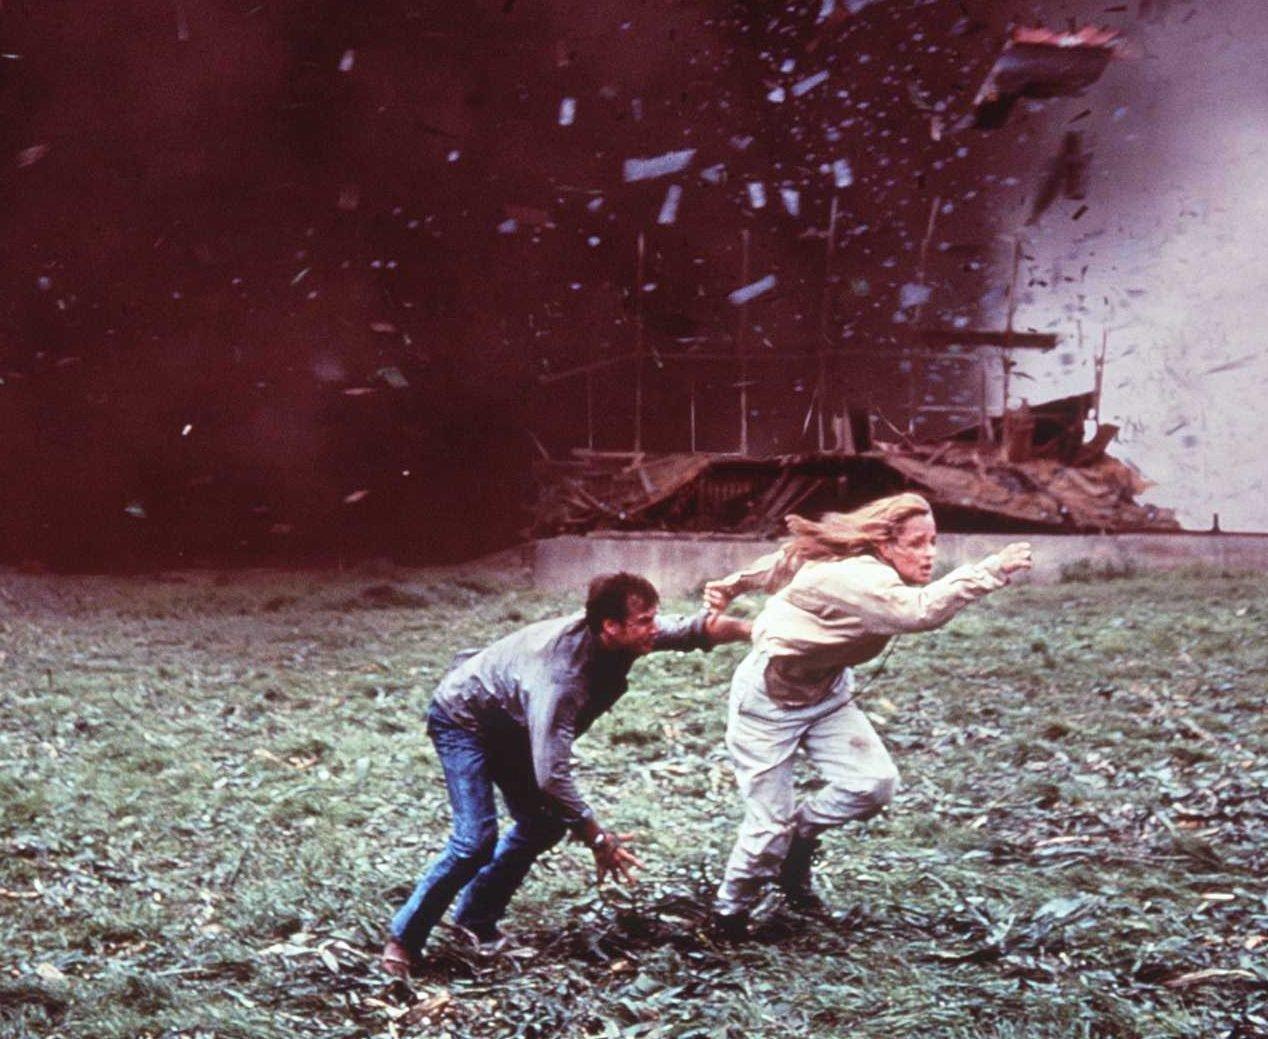 MV5BMTQwNTI1OTUyM15BMl5BanBnXkFtZTgwMTg4NzY3MTE@. V1 e1620812415171 Twister: 20 Facts About The 1996 Blockbuster That Will Blow You Away